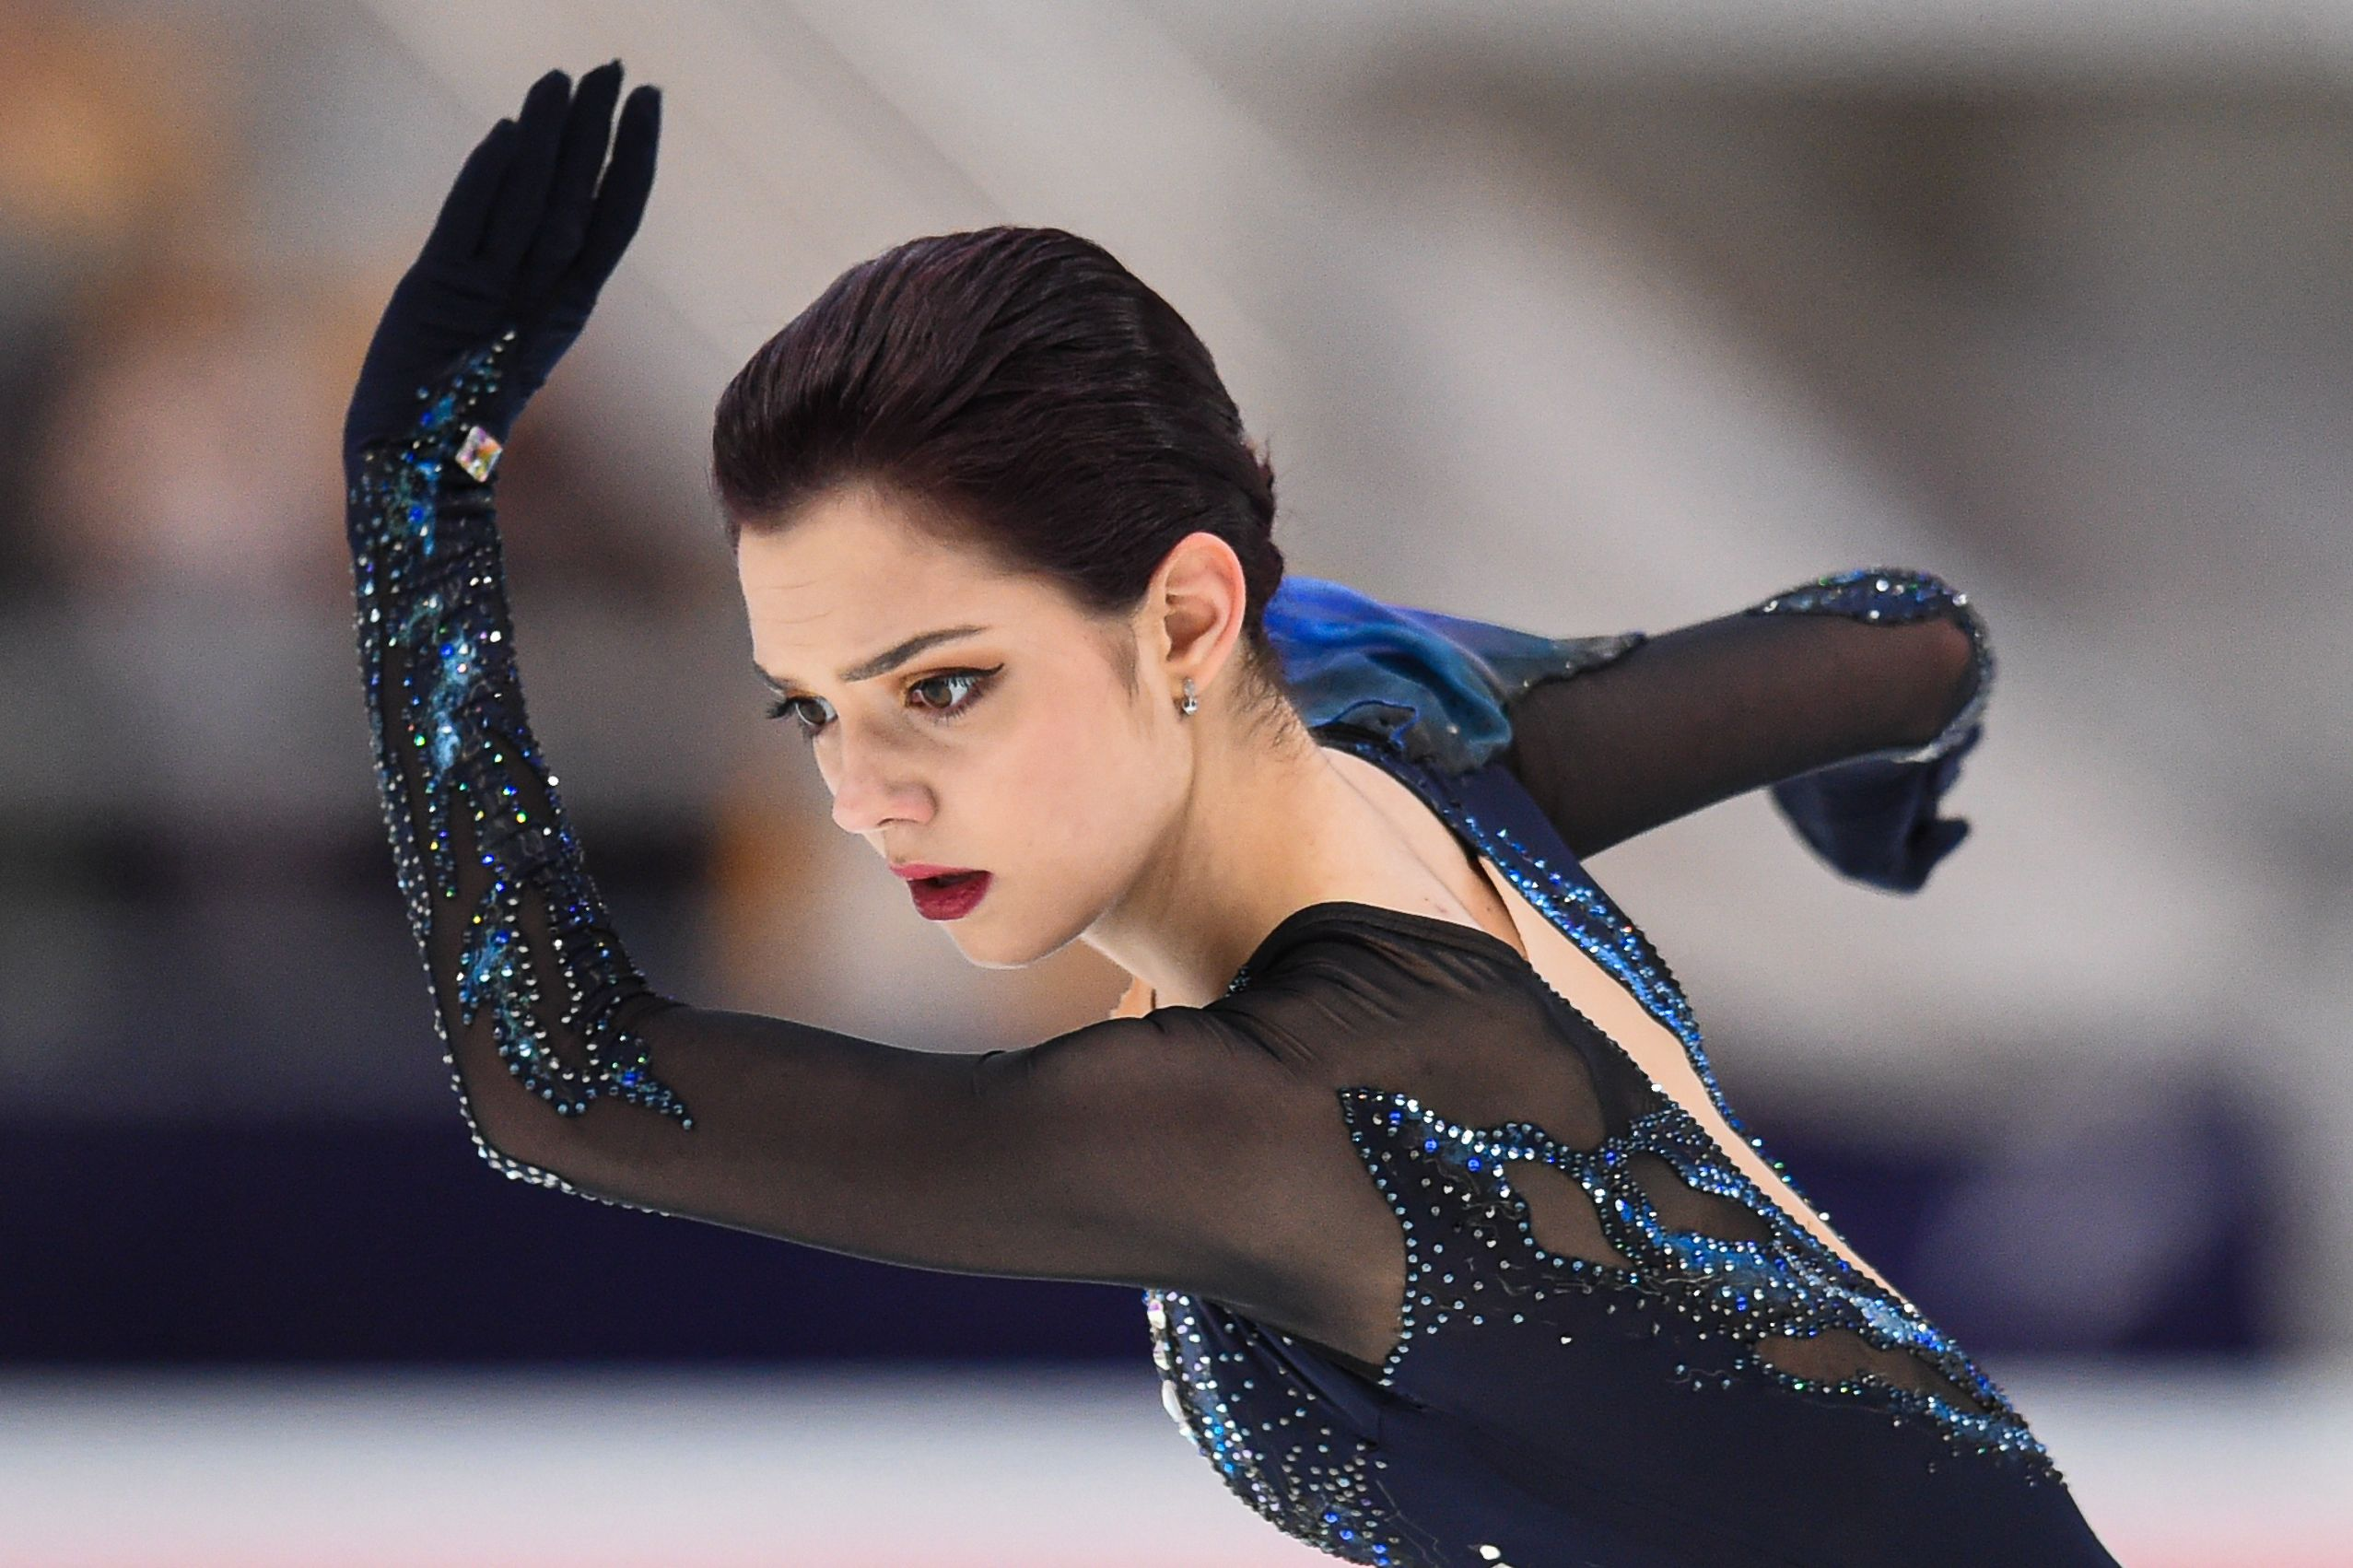 Коган объяснил, почему Медведева будет бороться за медали в олимпийском сезоне